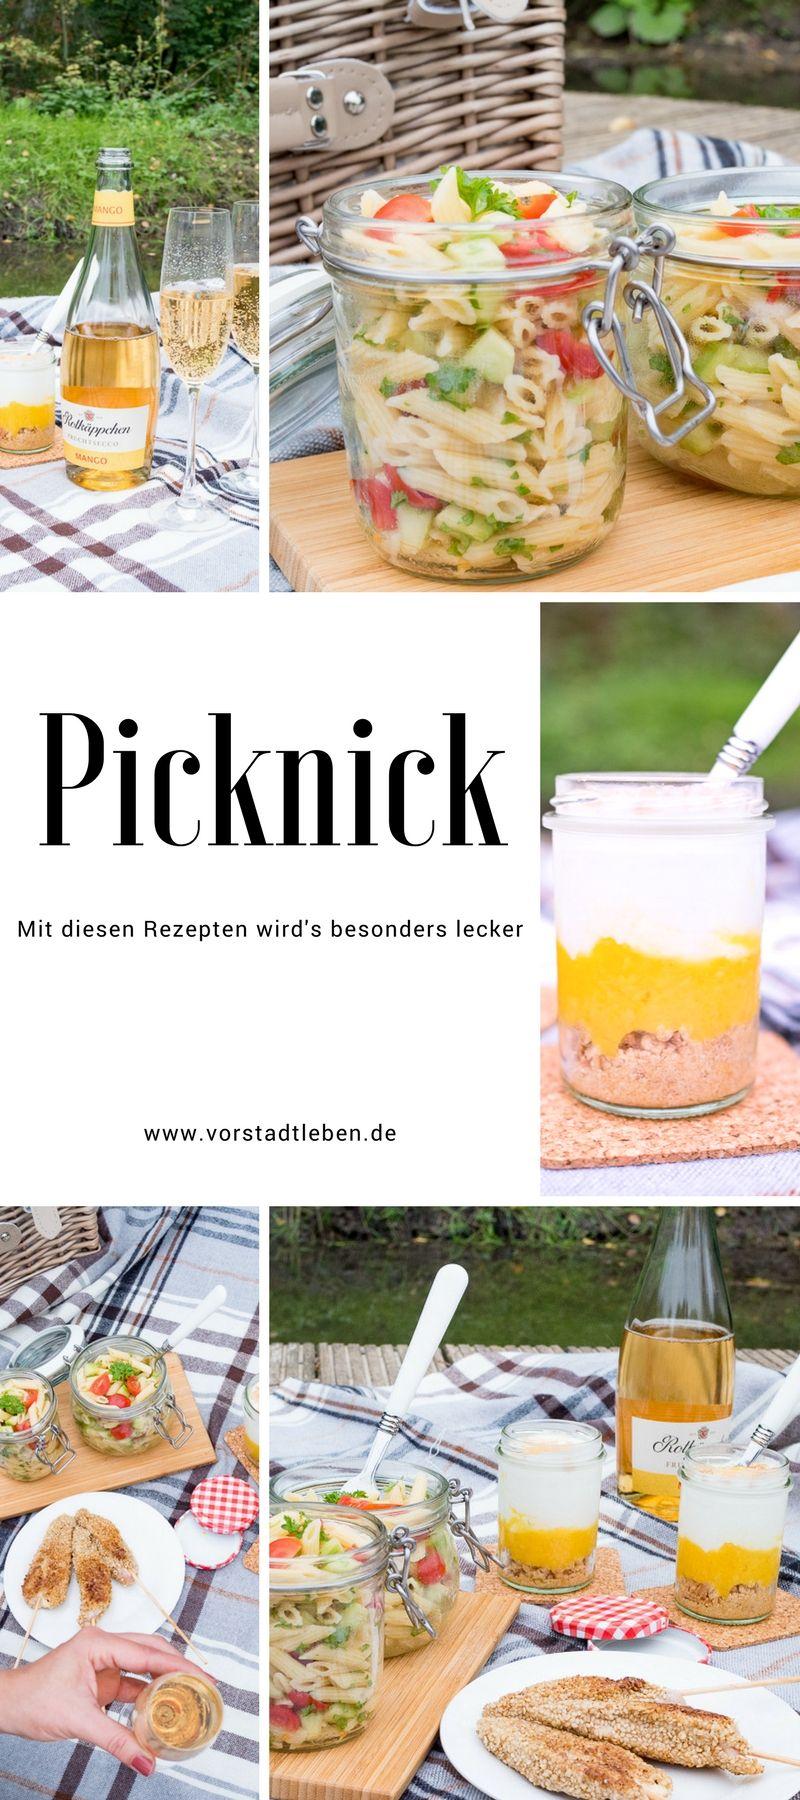 Picknick rezepte zum mitnehmen